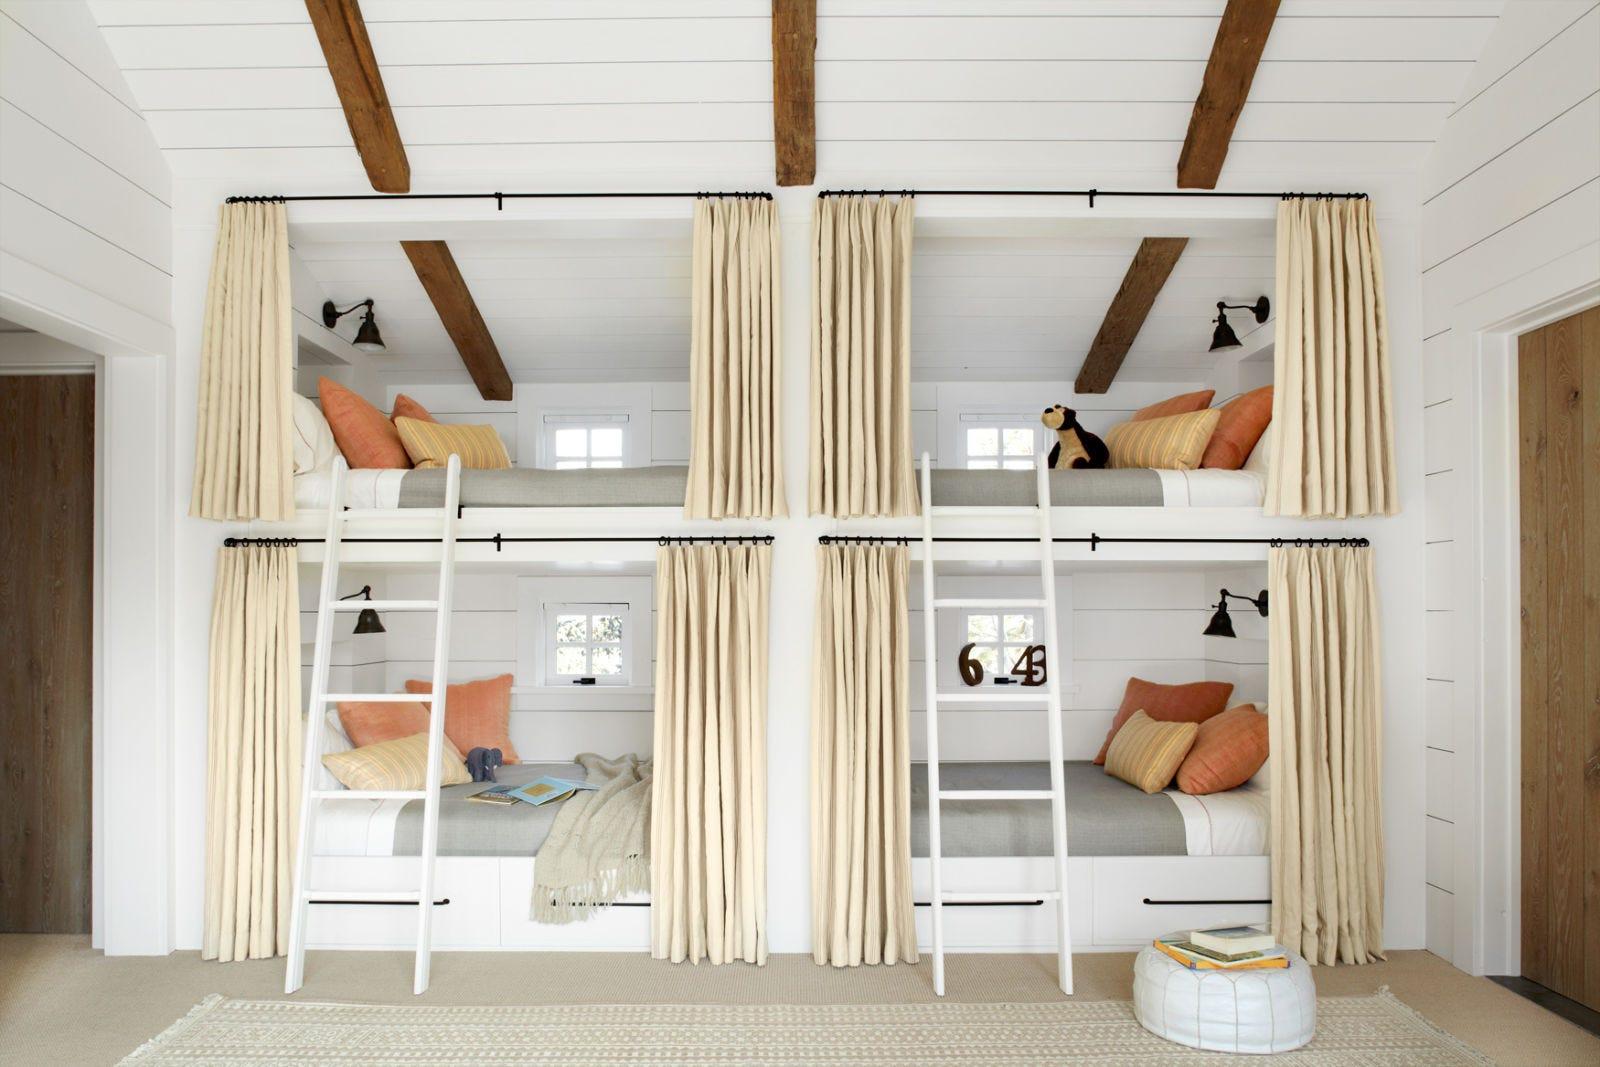 Room, Interior design, Floor, Wall, Flooring, Ceiling, Shelving, Bed, Hardwood, Interior design,